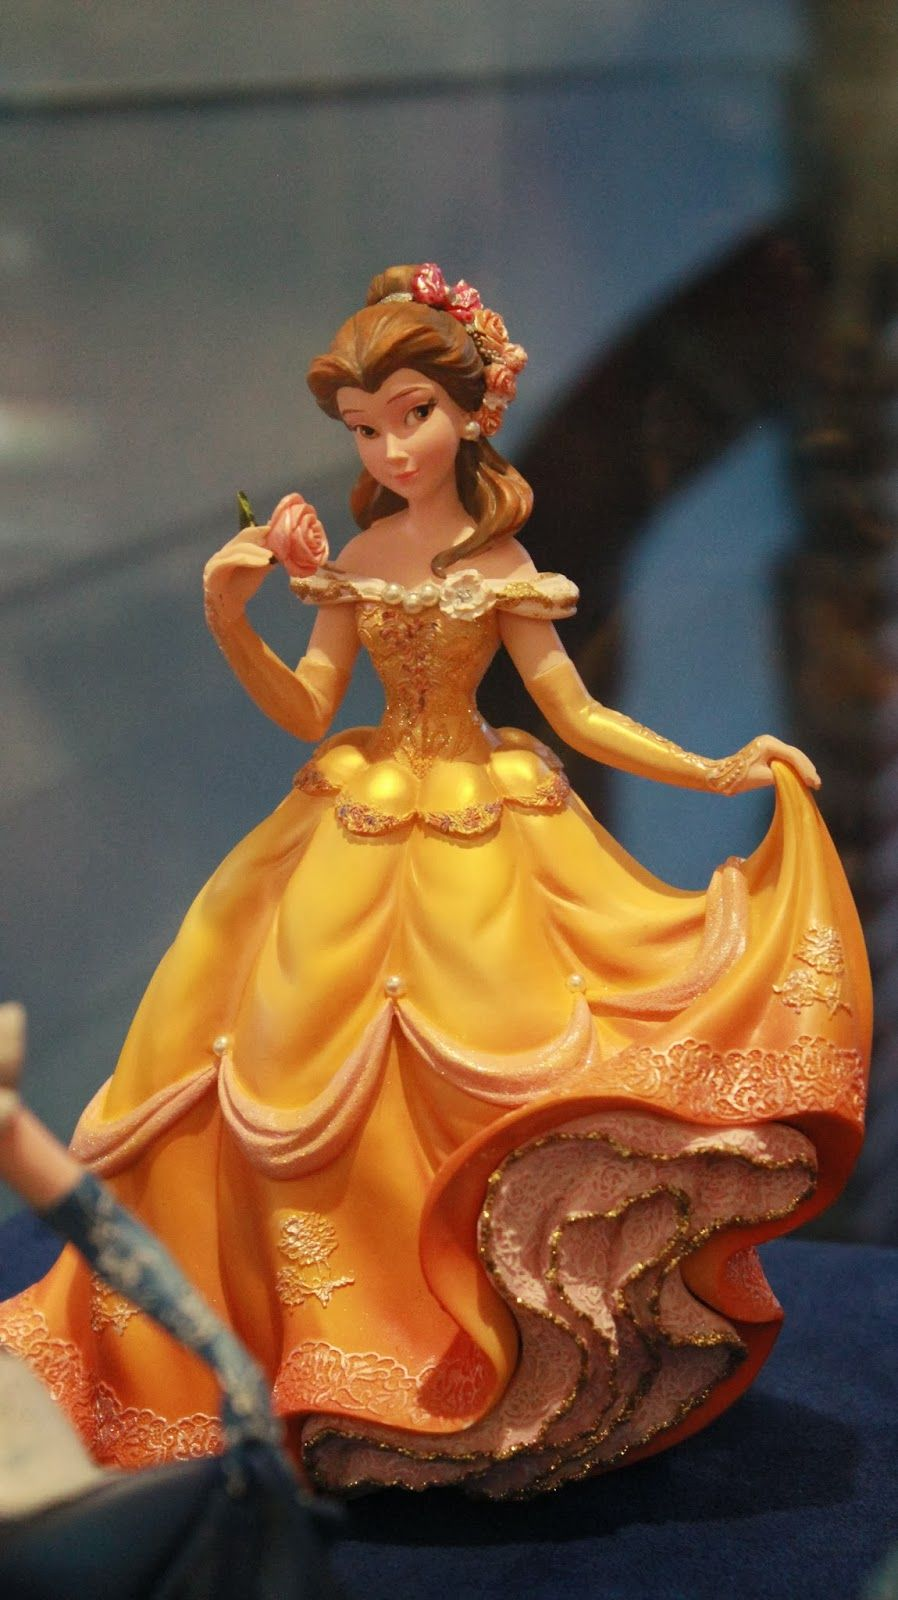 Belle ornament disney - Belle Disney Princess Figurine 65 00 At The Art Of Disney In Disneyworld